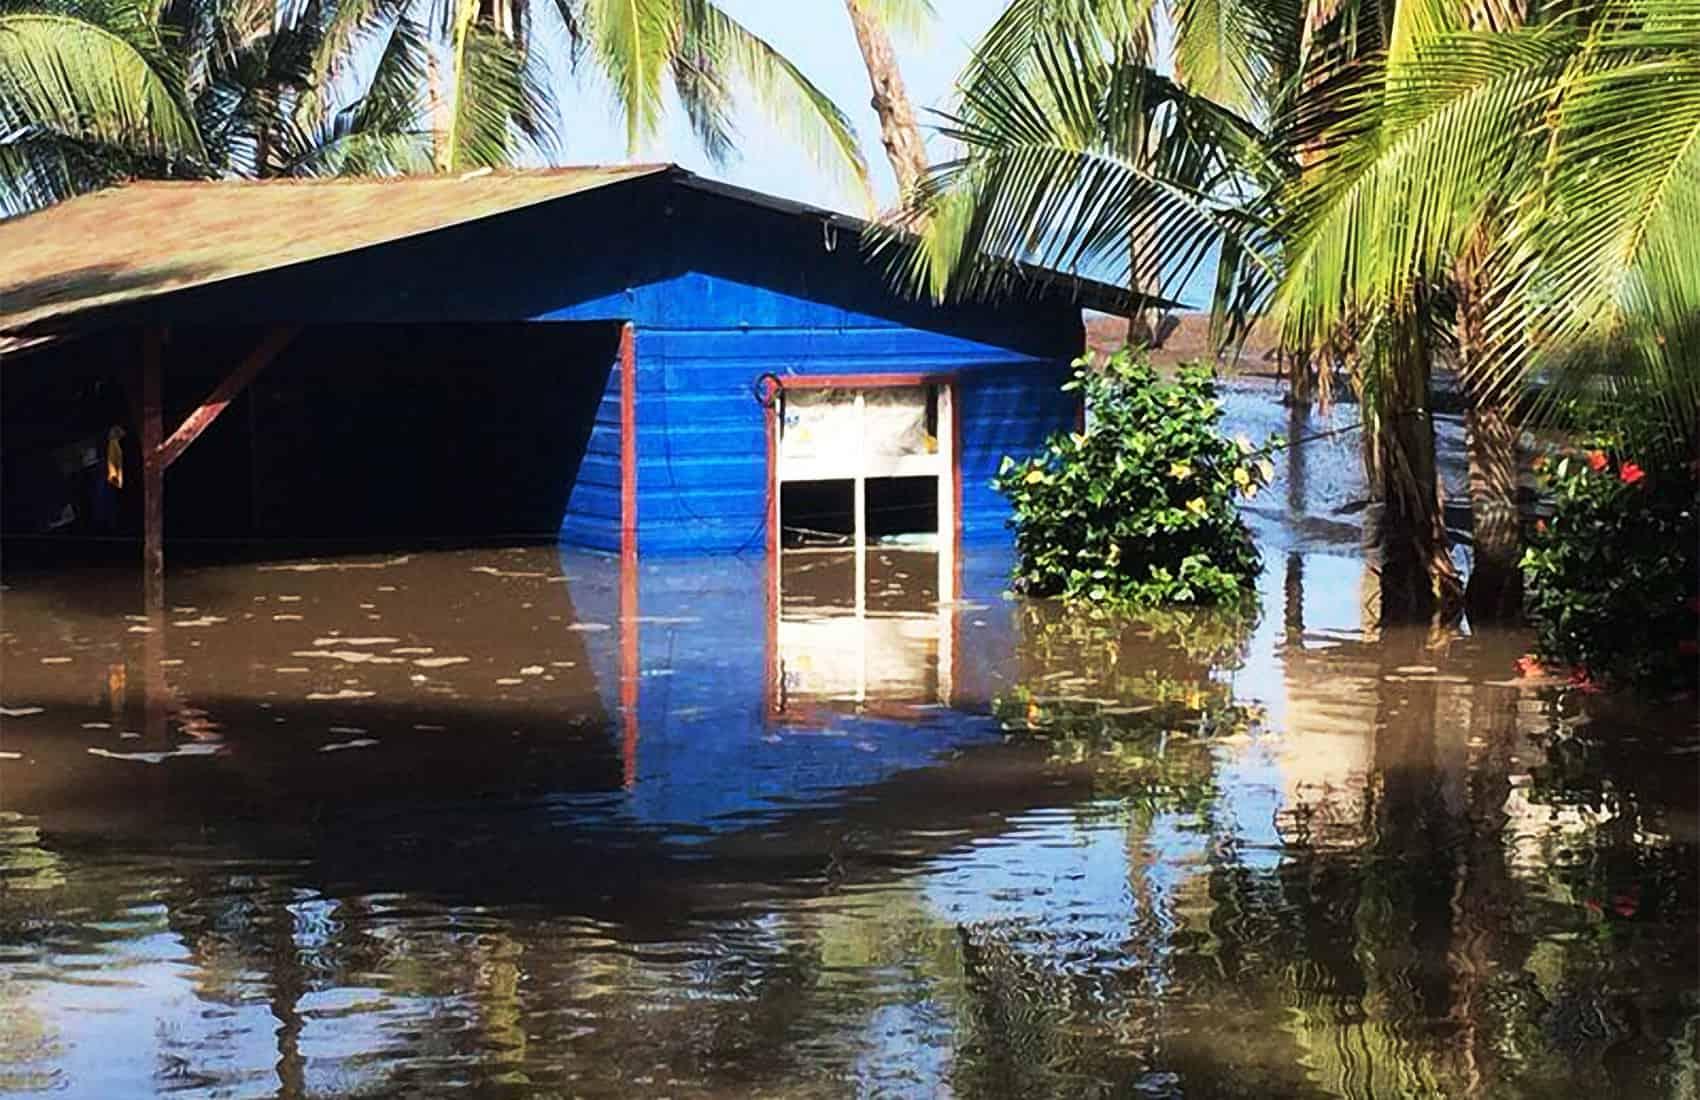 Floodings in Caldera, Puntarenas